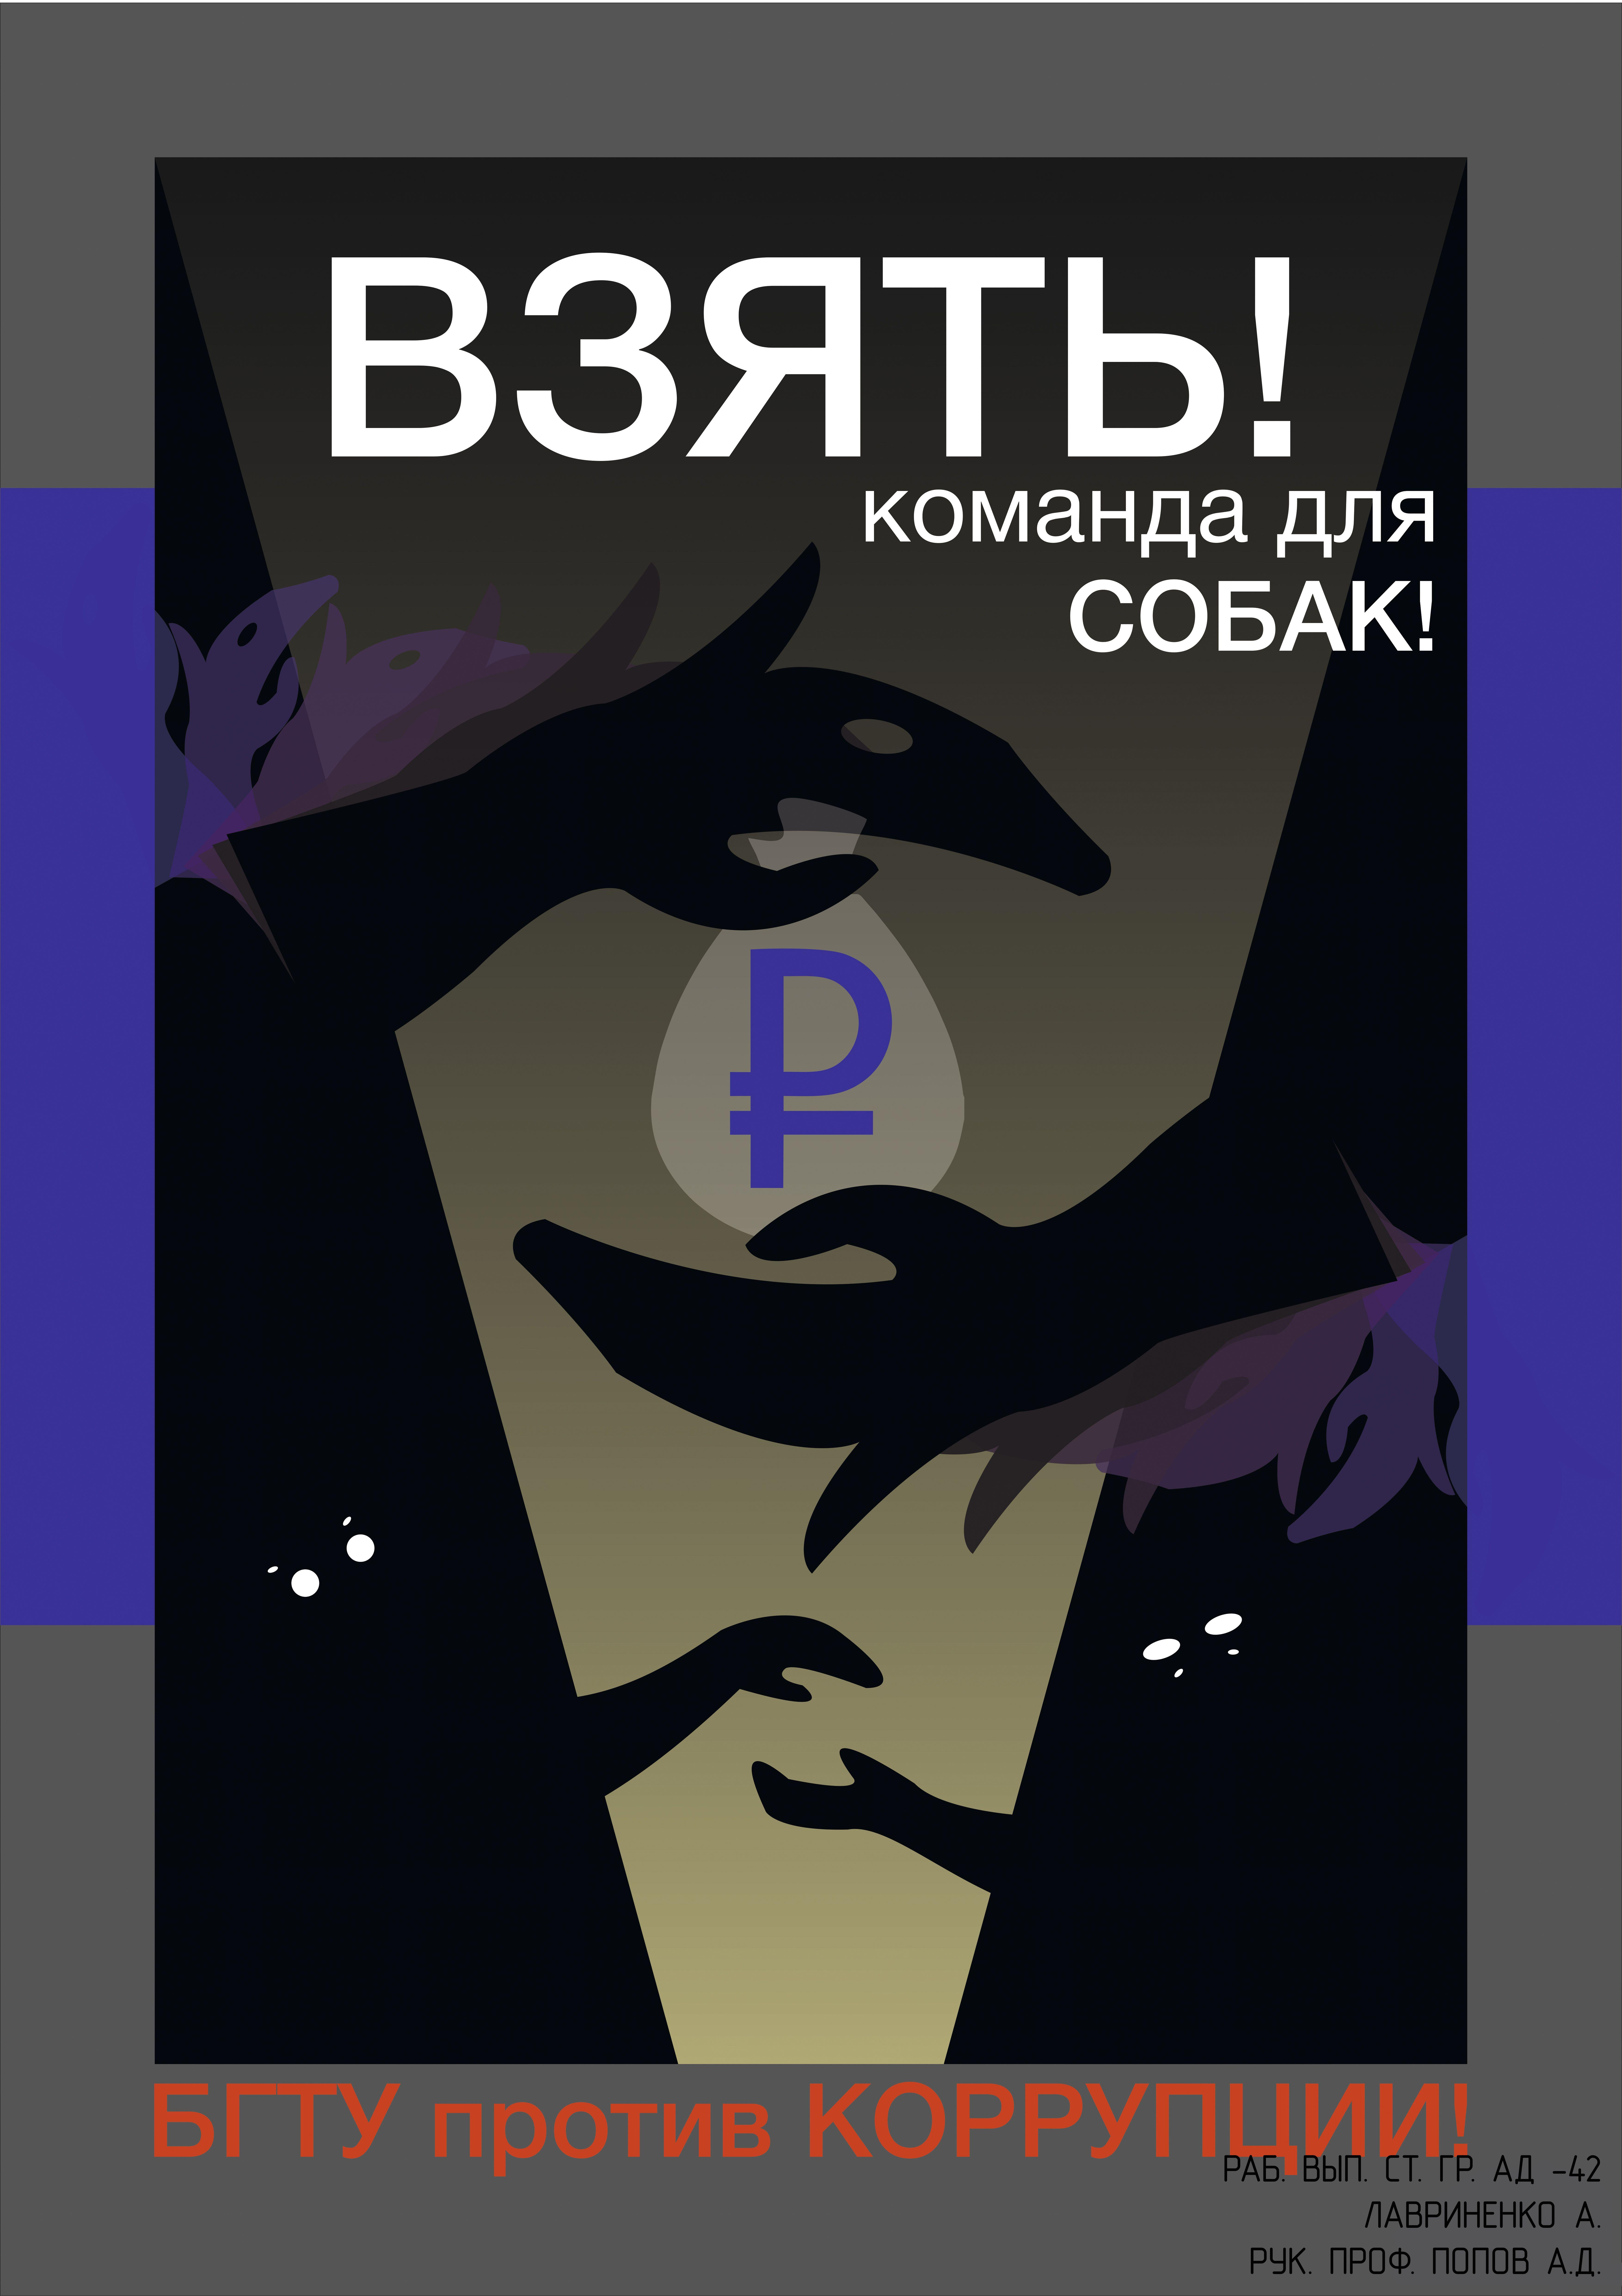 7.Лавриненко Ангелина 22 года г.Белгород